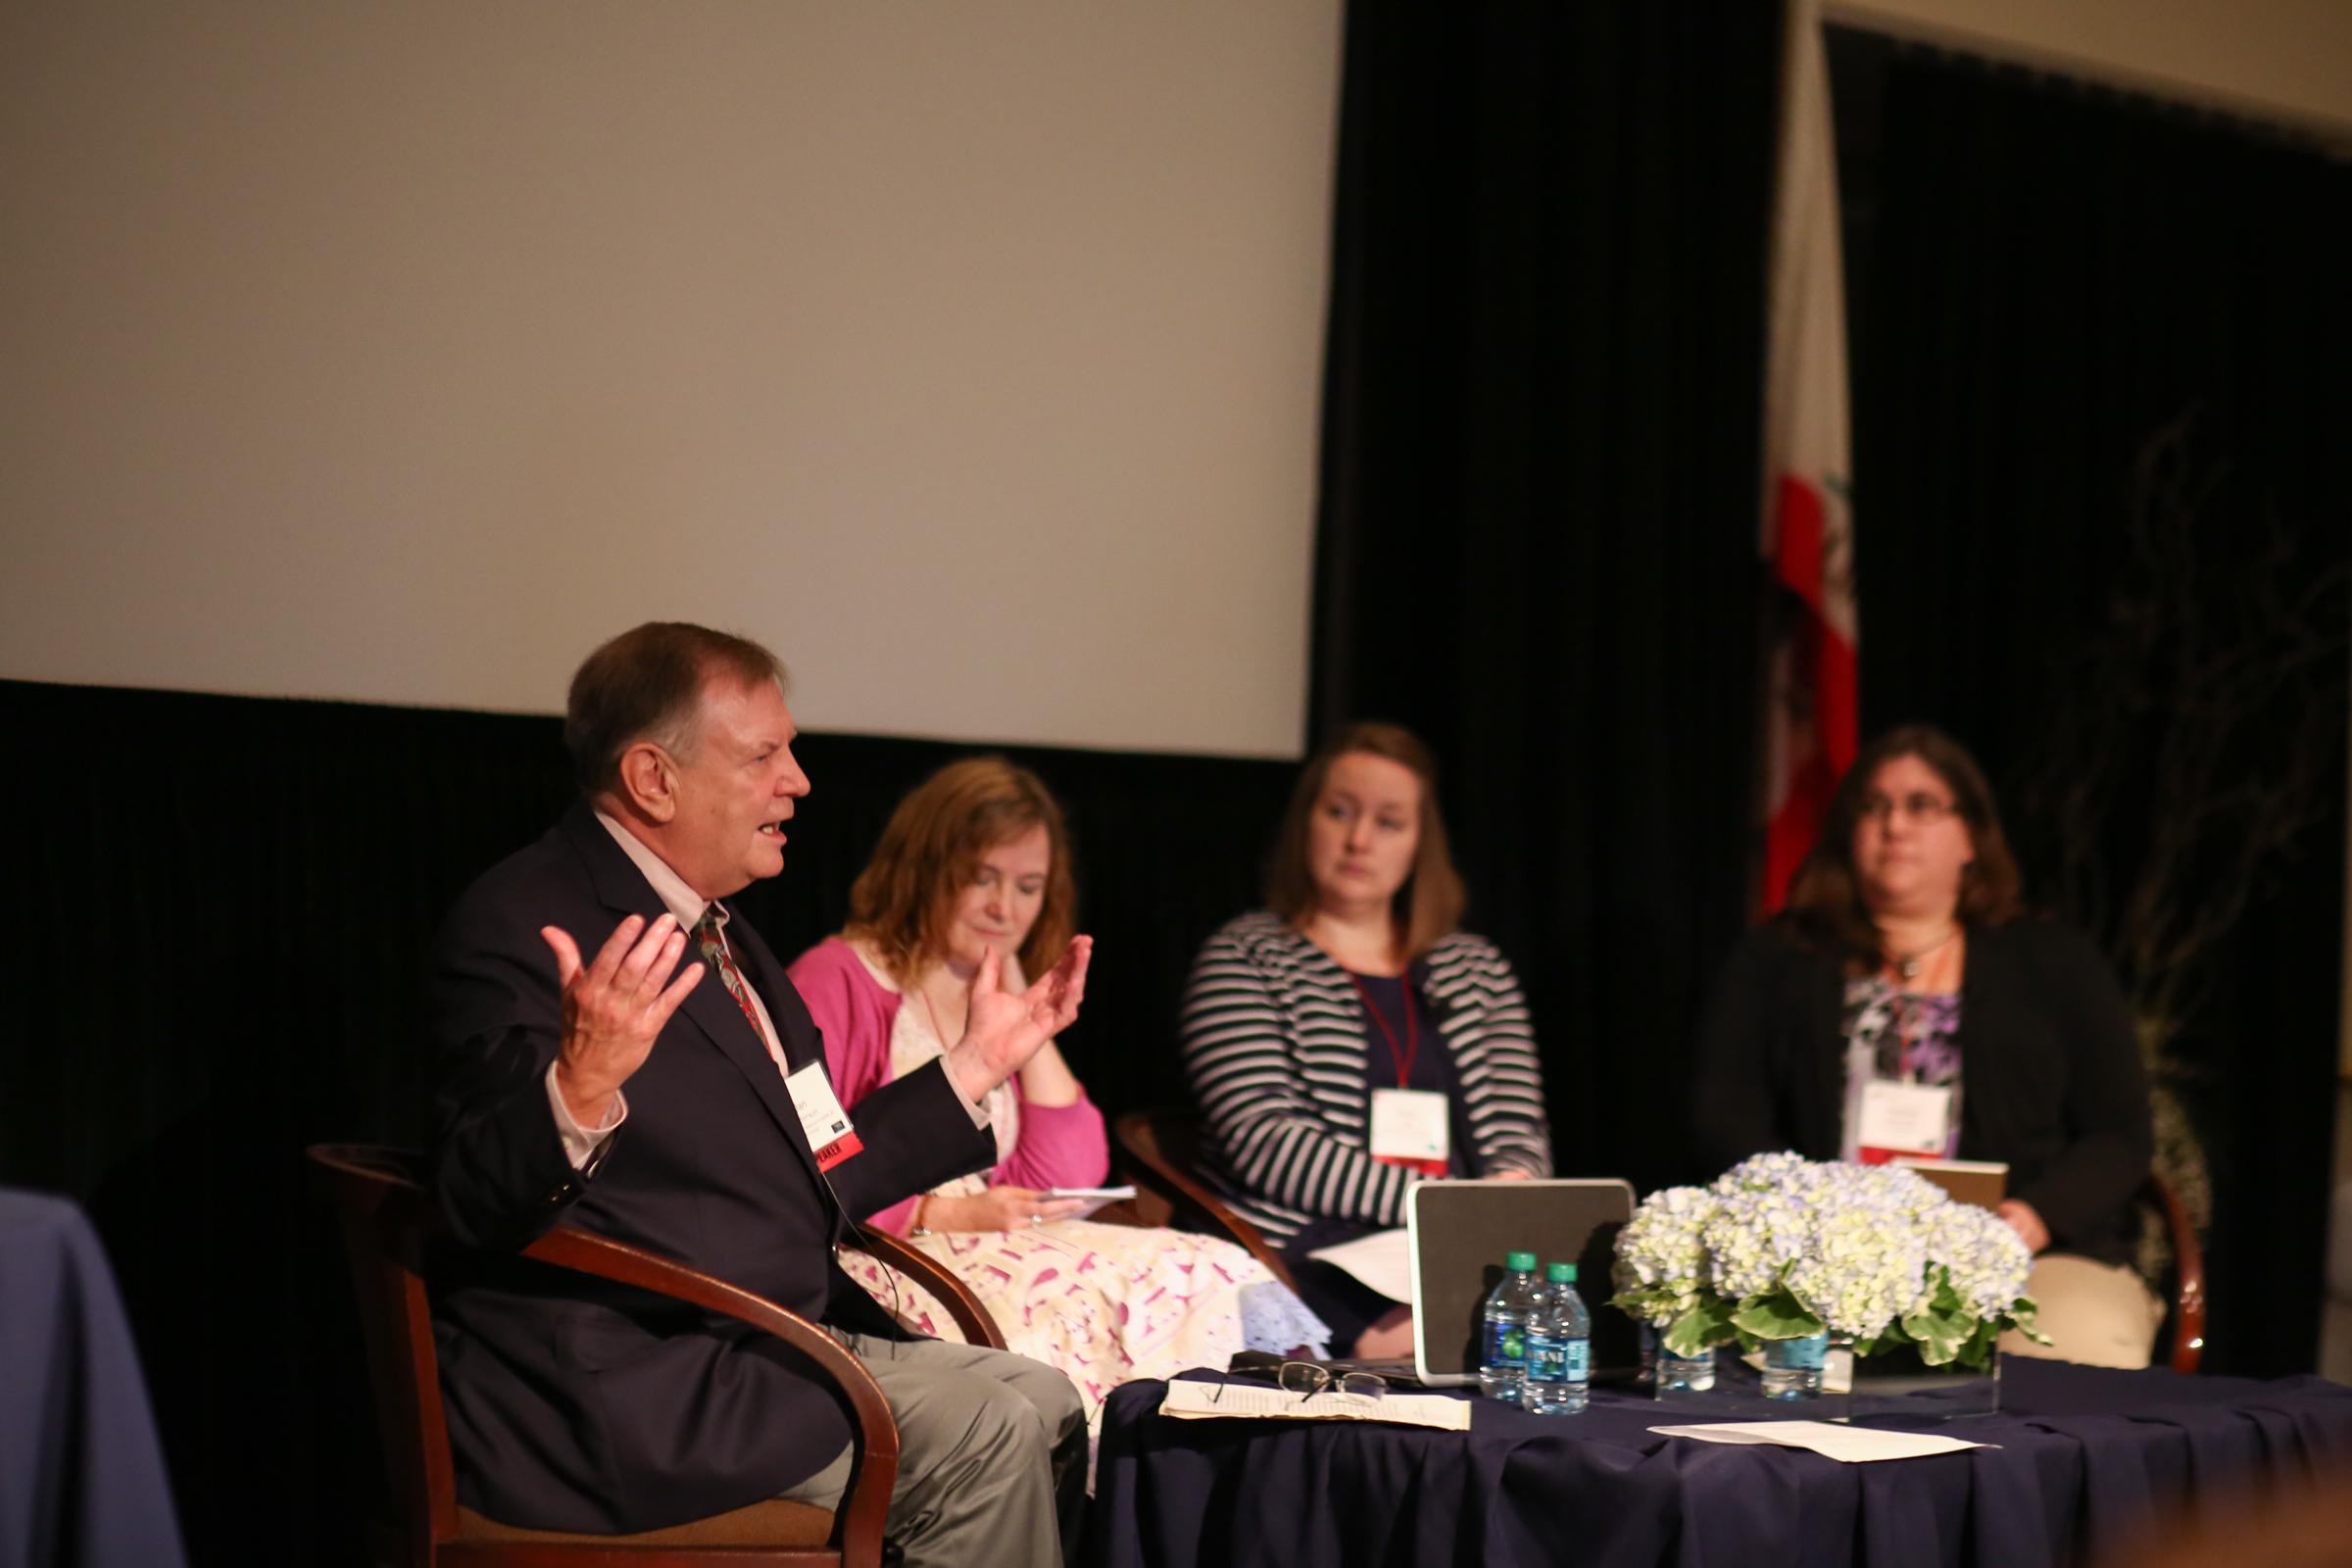 (left to right) Dan Anderson, Rachel Barr, Sarah Lytle, Heather Kirkorian